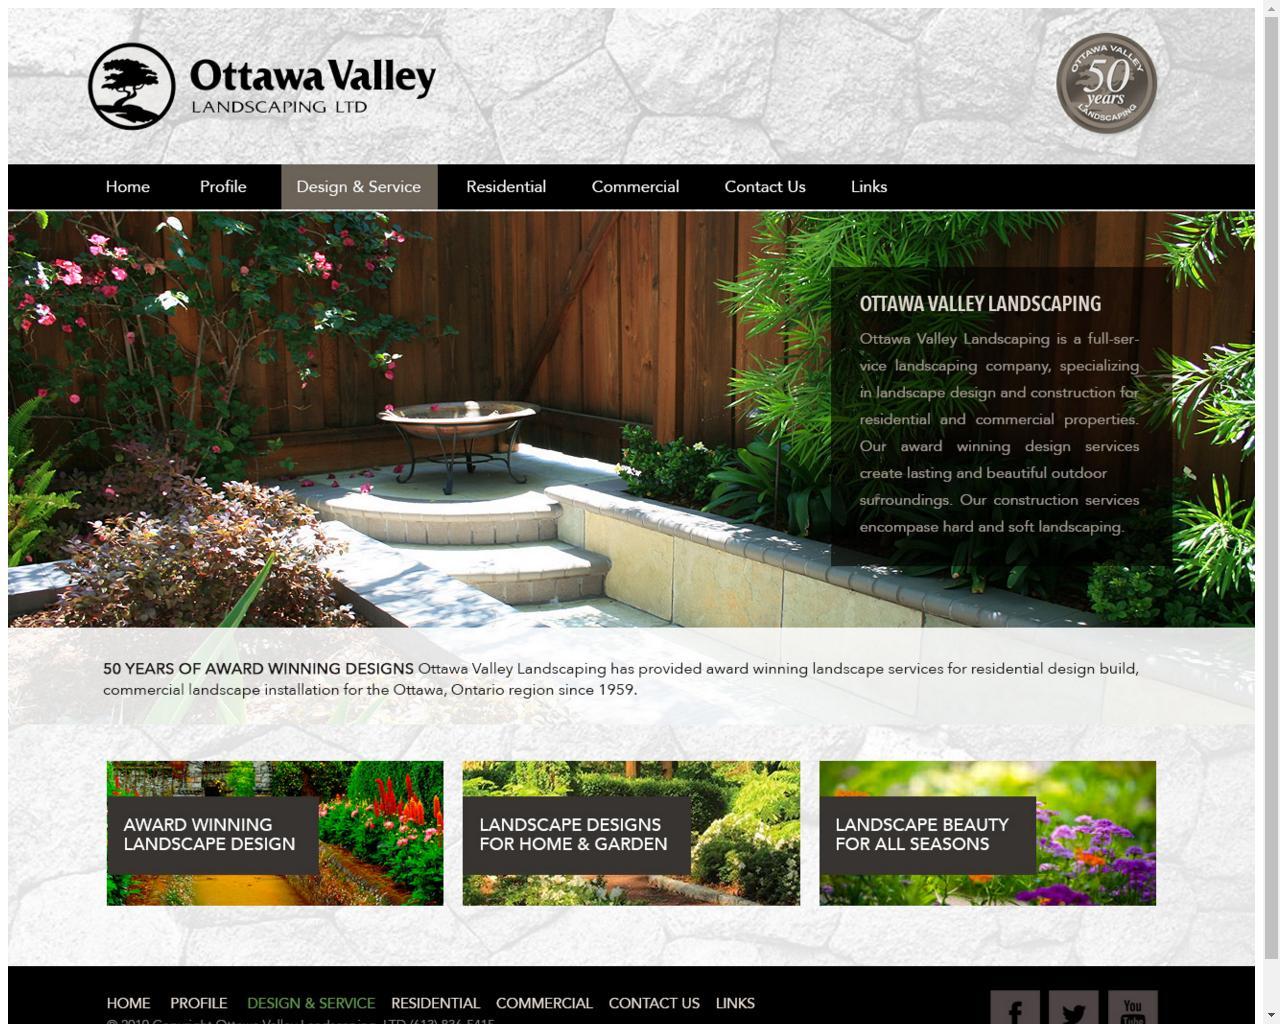 Ottawa Valley Landscaping